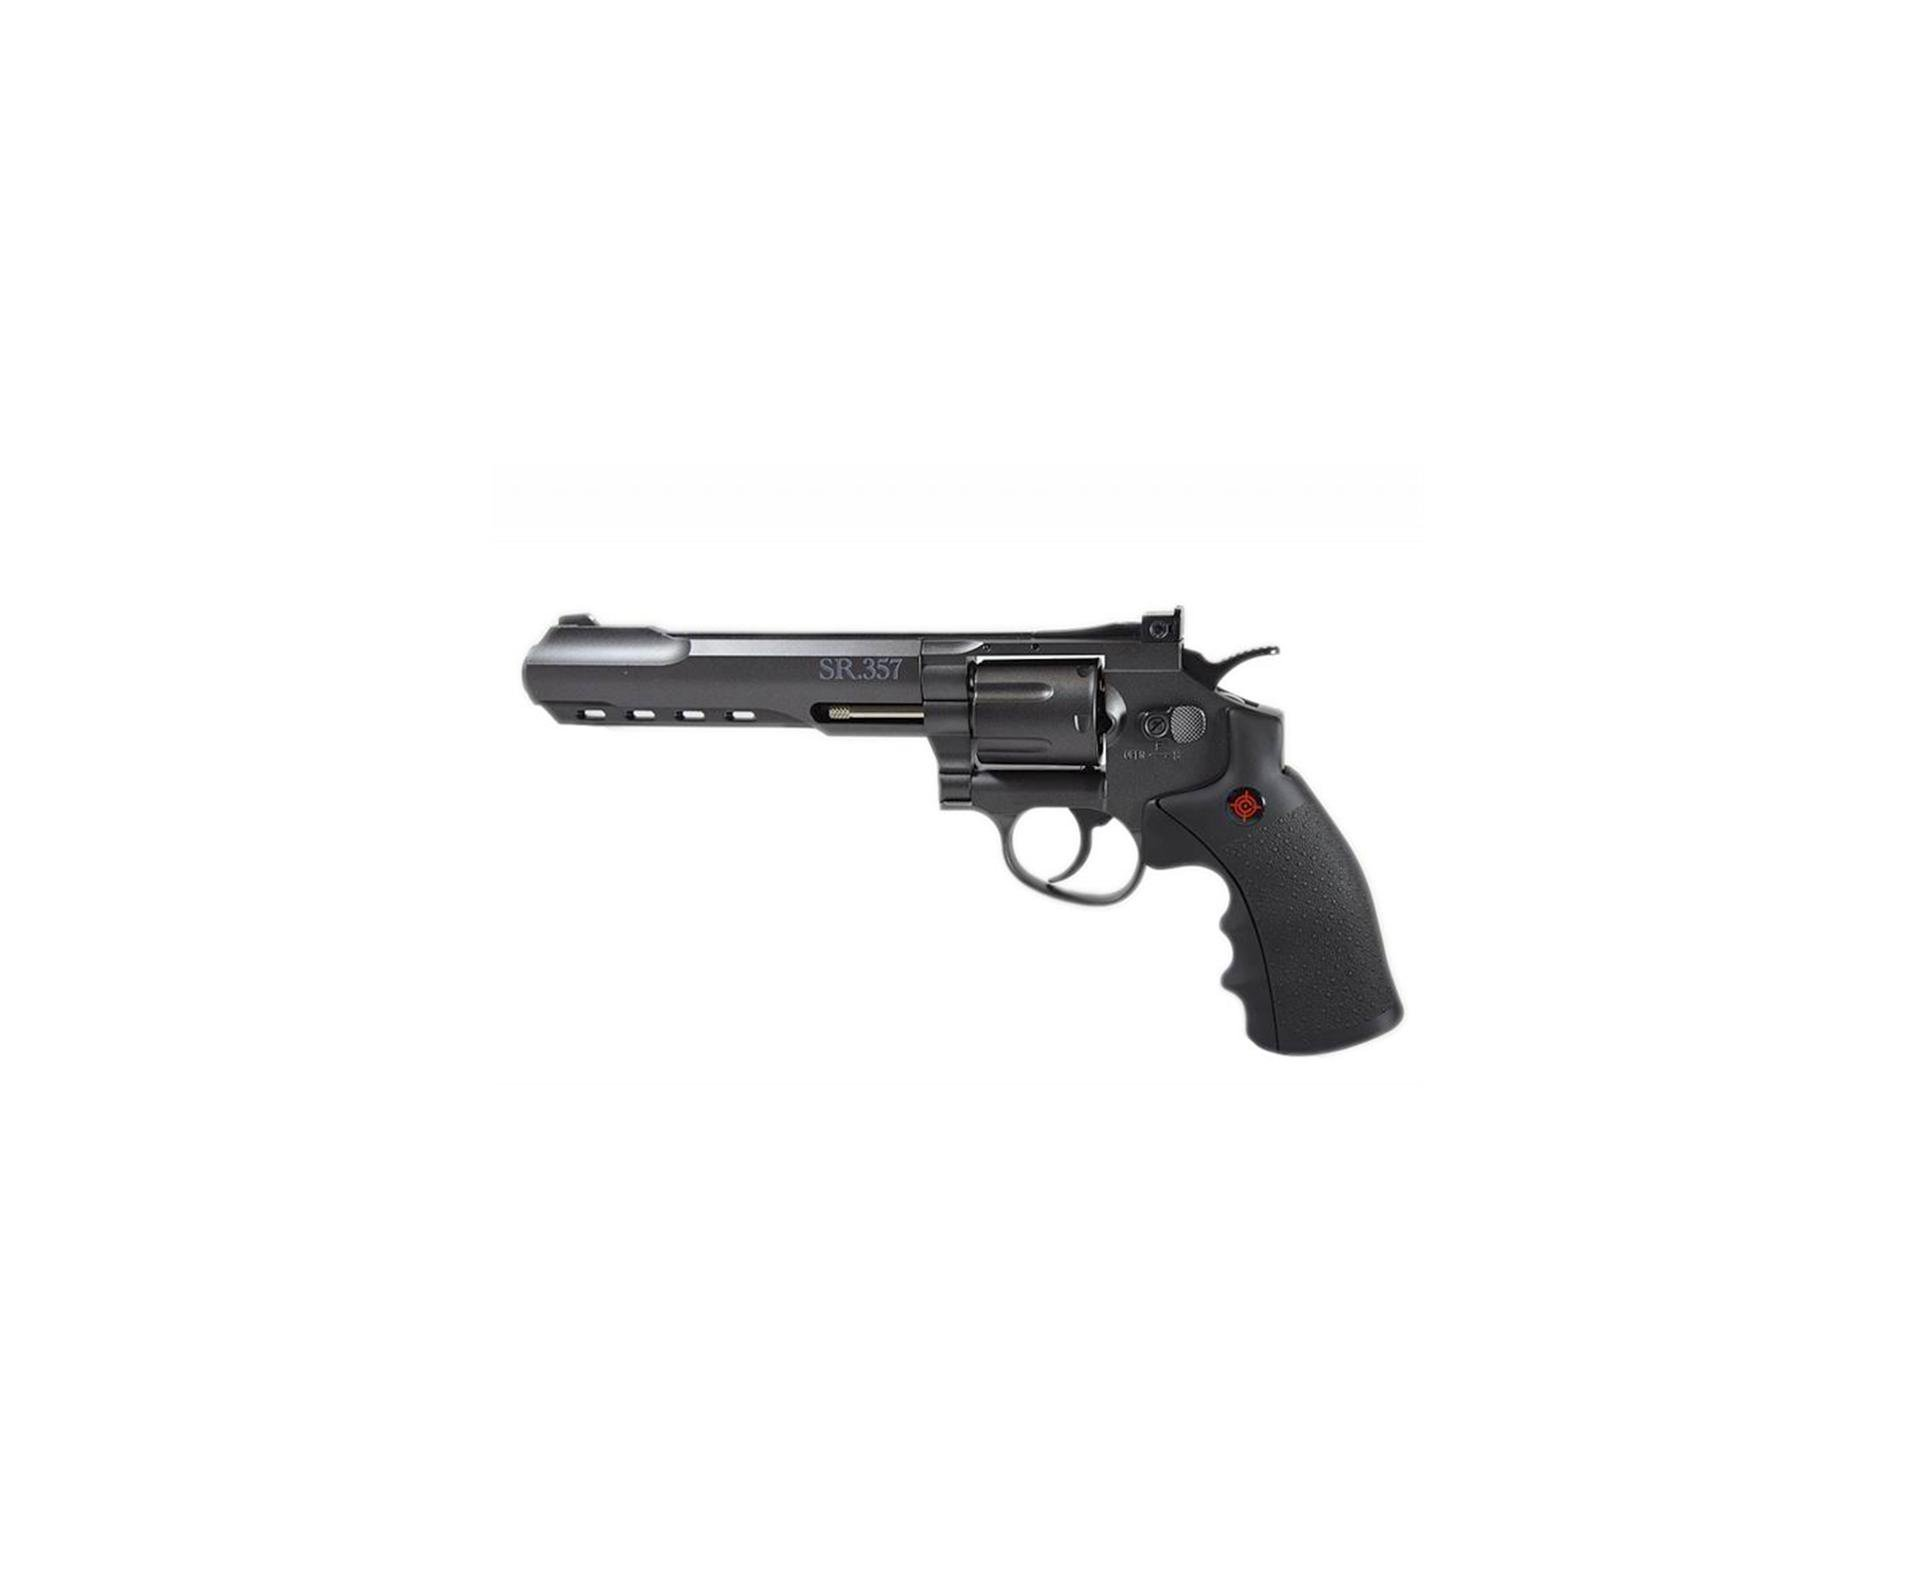 "Revolver De Pressão Gas Co2 Sr357 Black 6"" Full Metal Dual Ammo 6 Tiros 4,5mm Crosman"